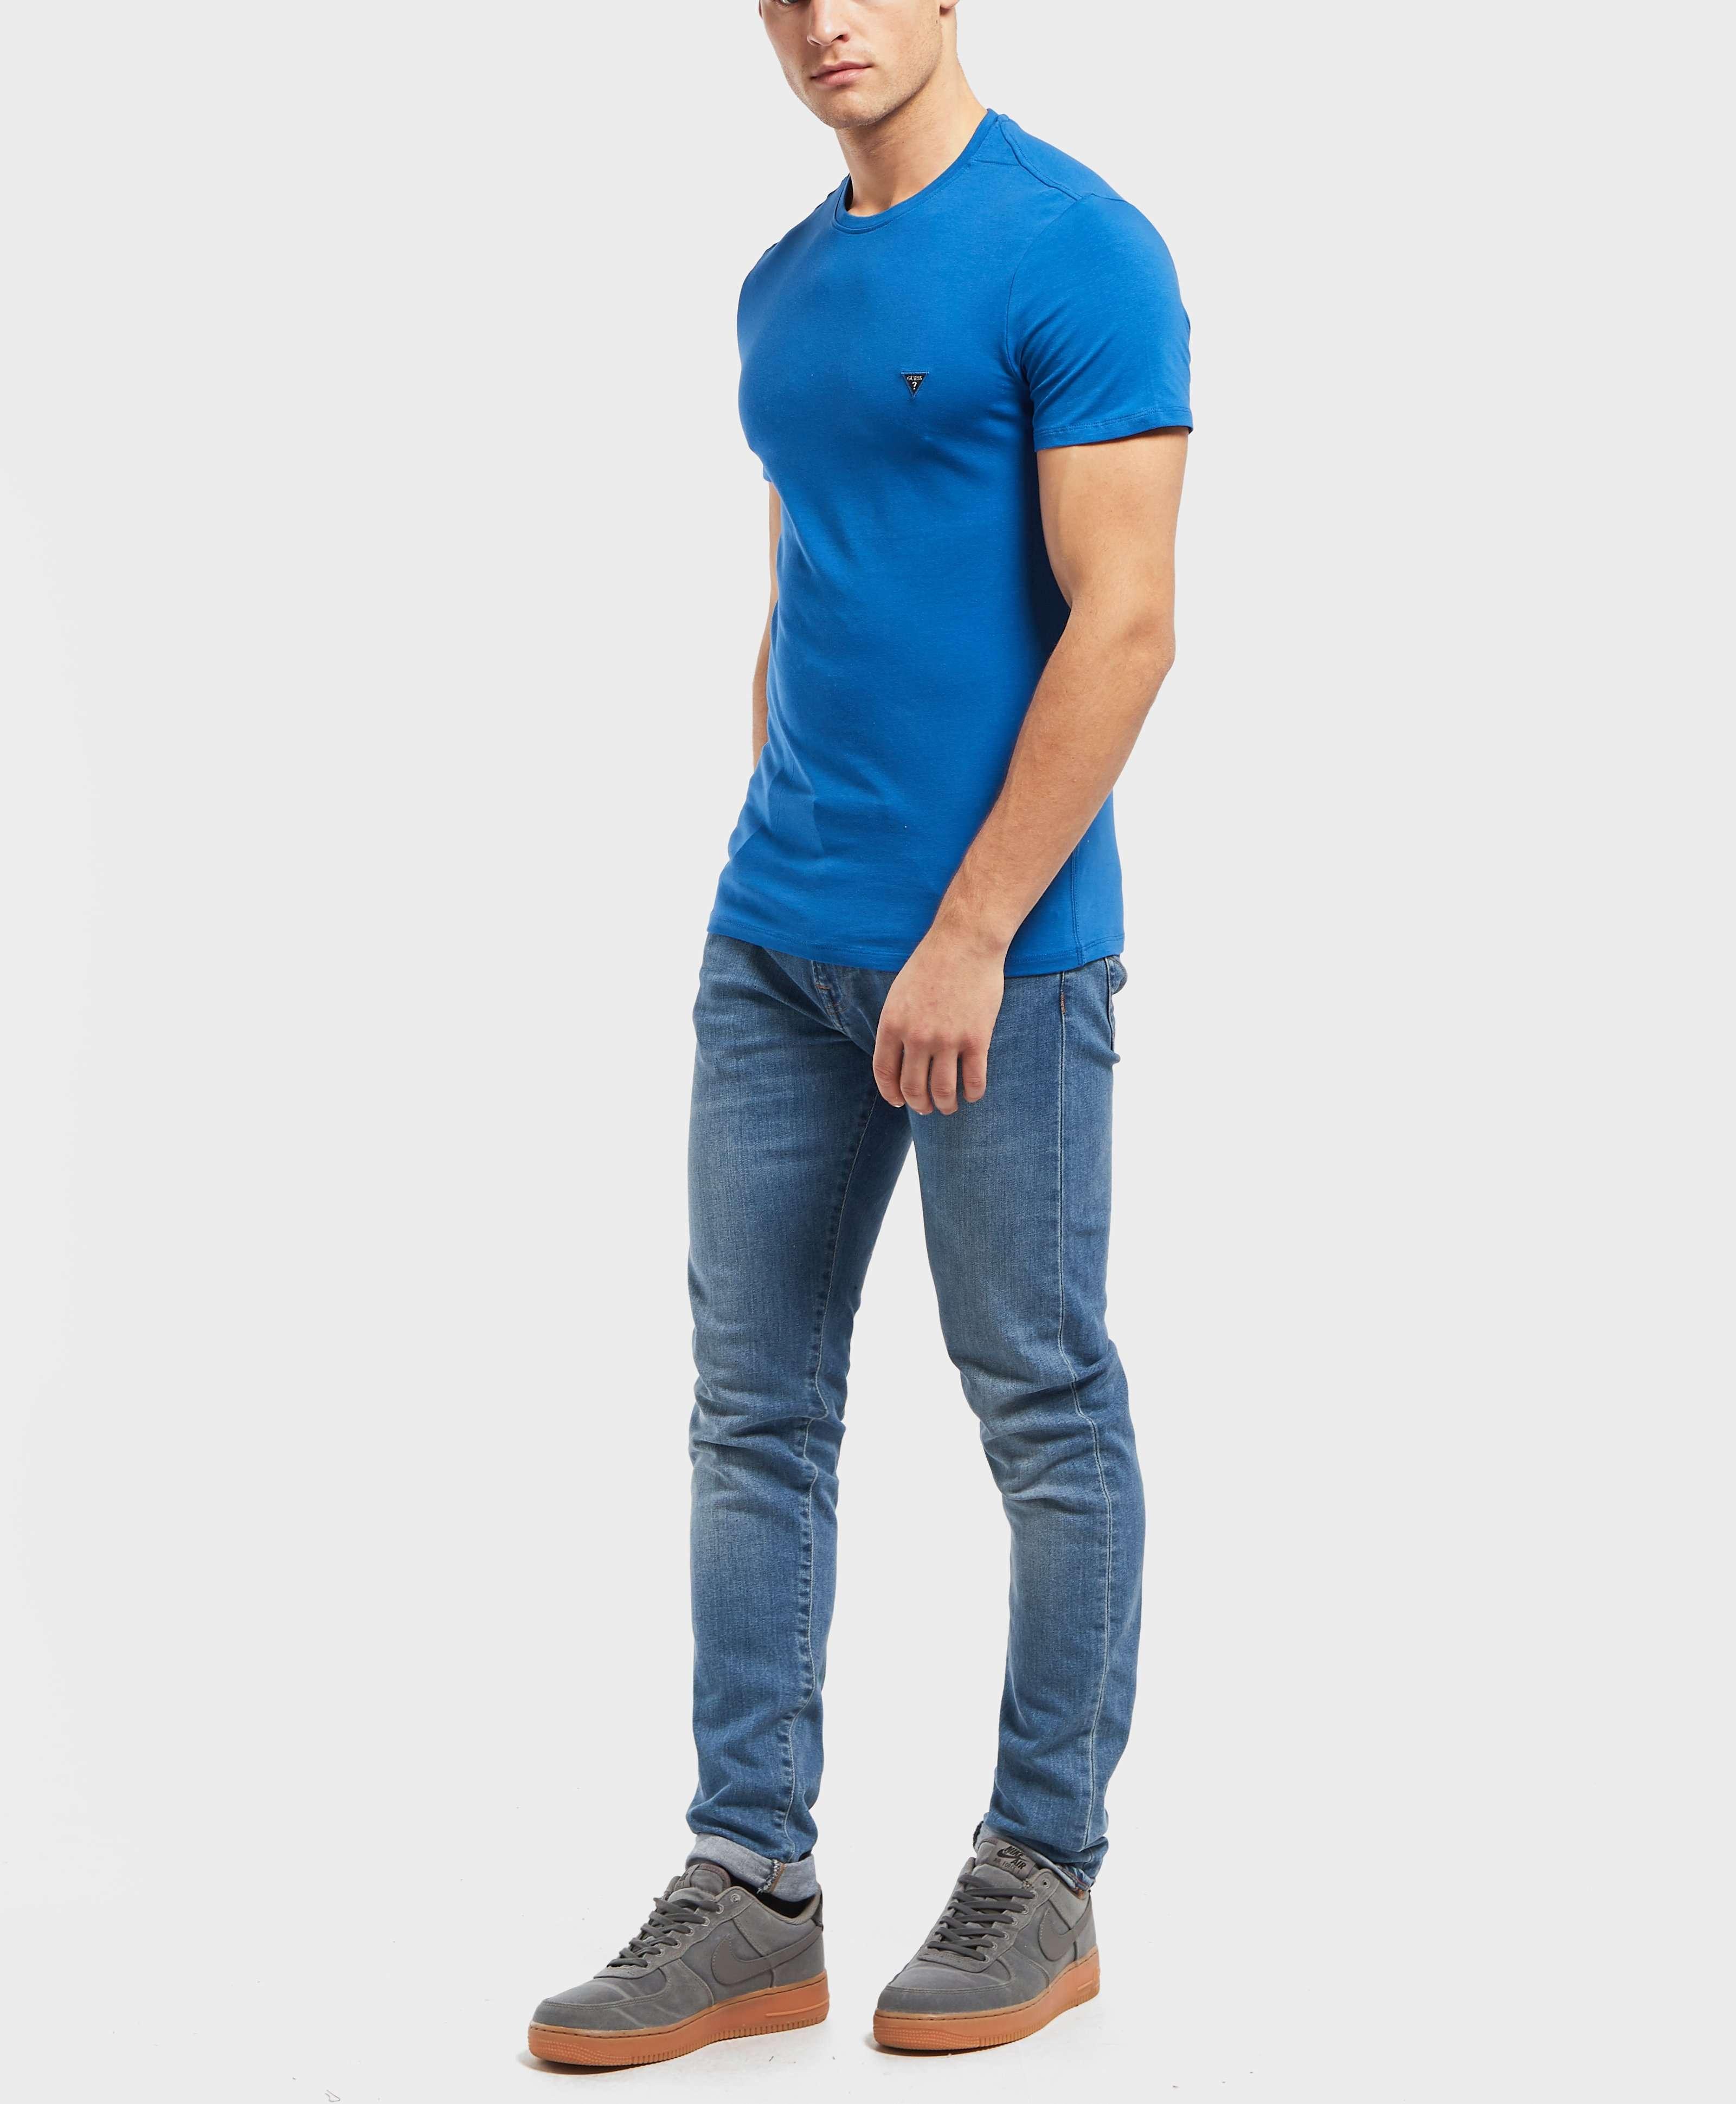 Guess Mini Logo Short Sleeve T-Shirt - Online Exclusive